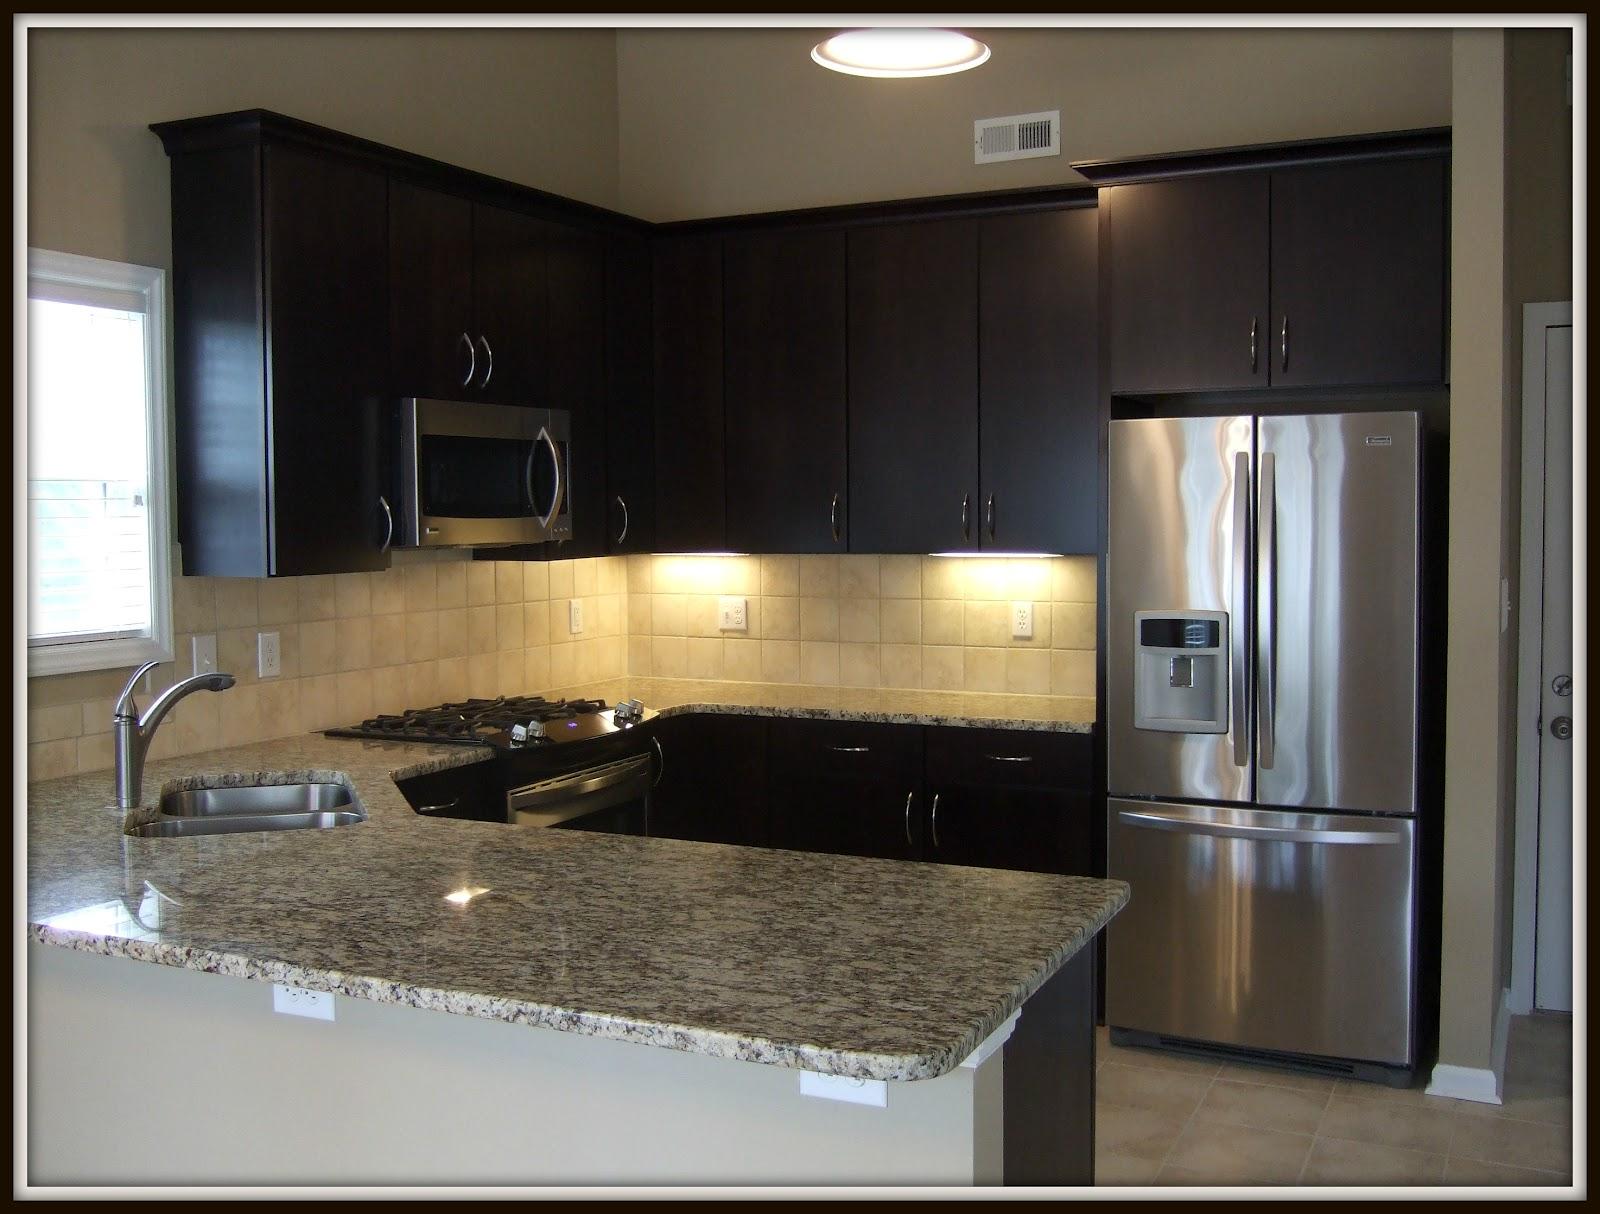 WD Osborne Design Construction 919 4932936 Kitchens